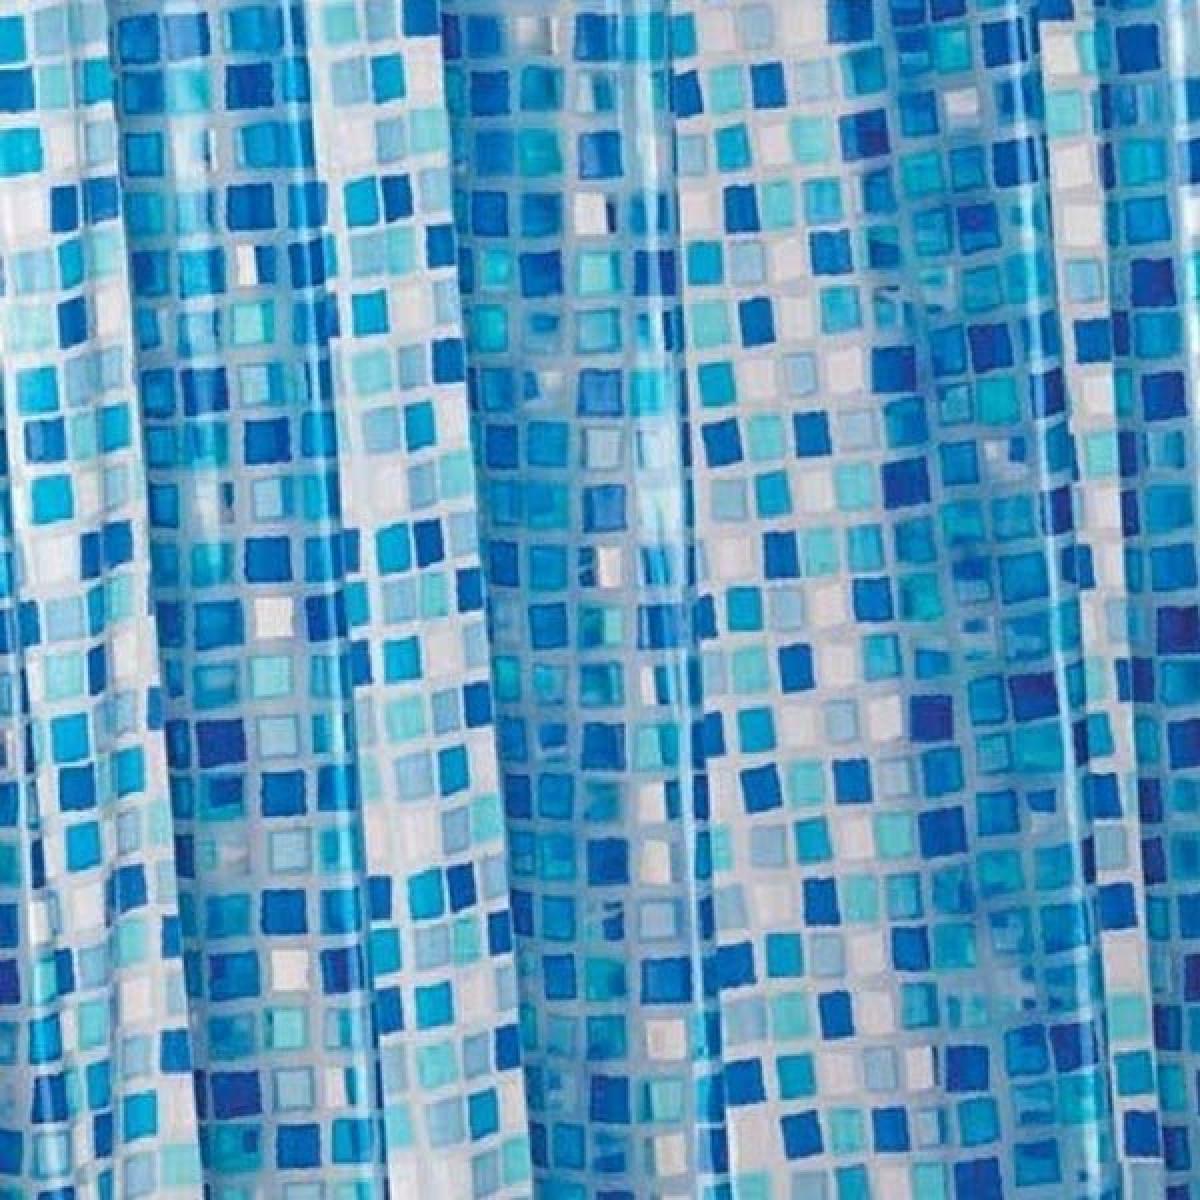 croydex blue mosaic pvc shower curtain ae543424. Black Bedroom Furniture Sets. Home Design Ideas